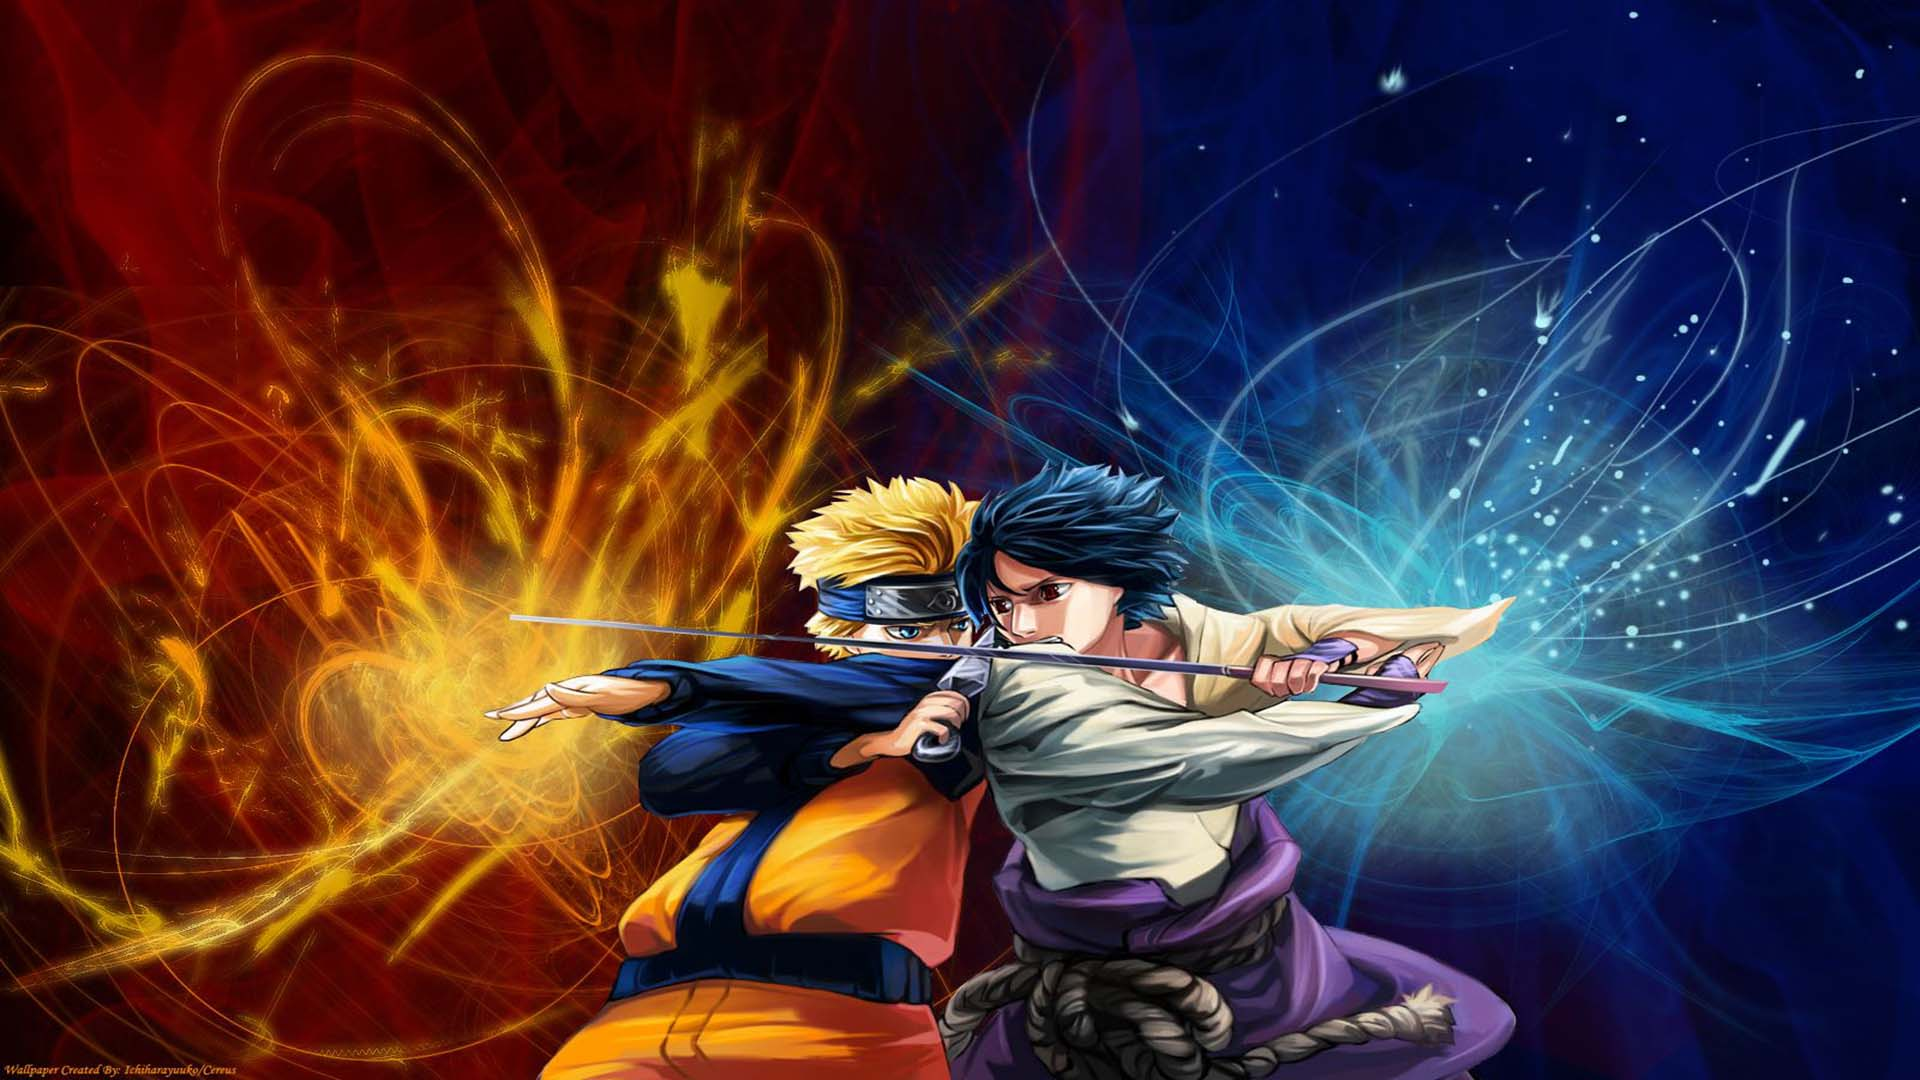 naruto et sasuke fonds d'ecran hd